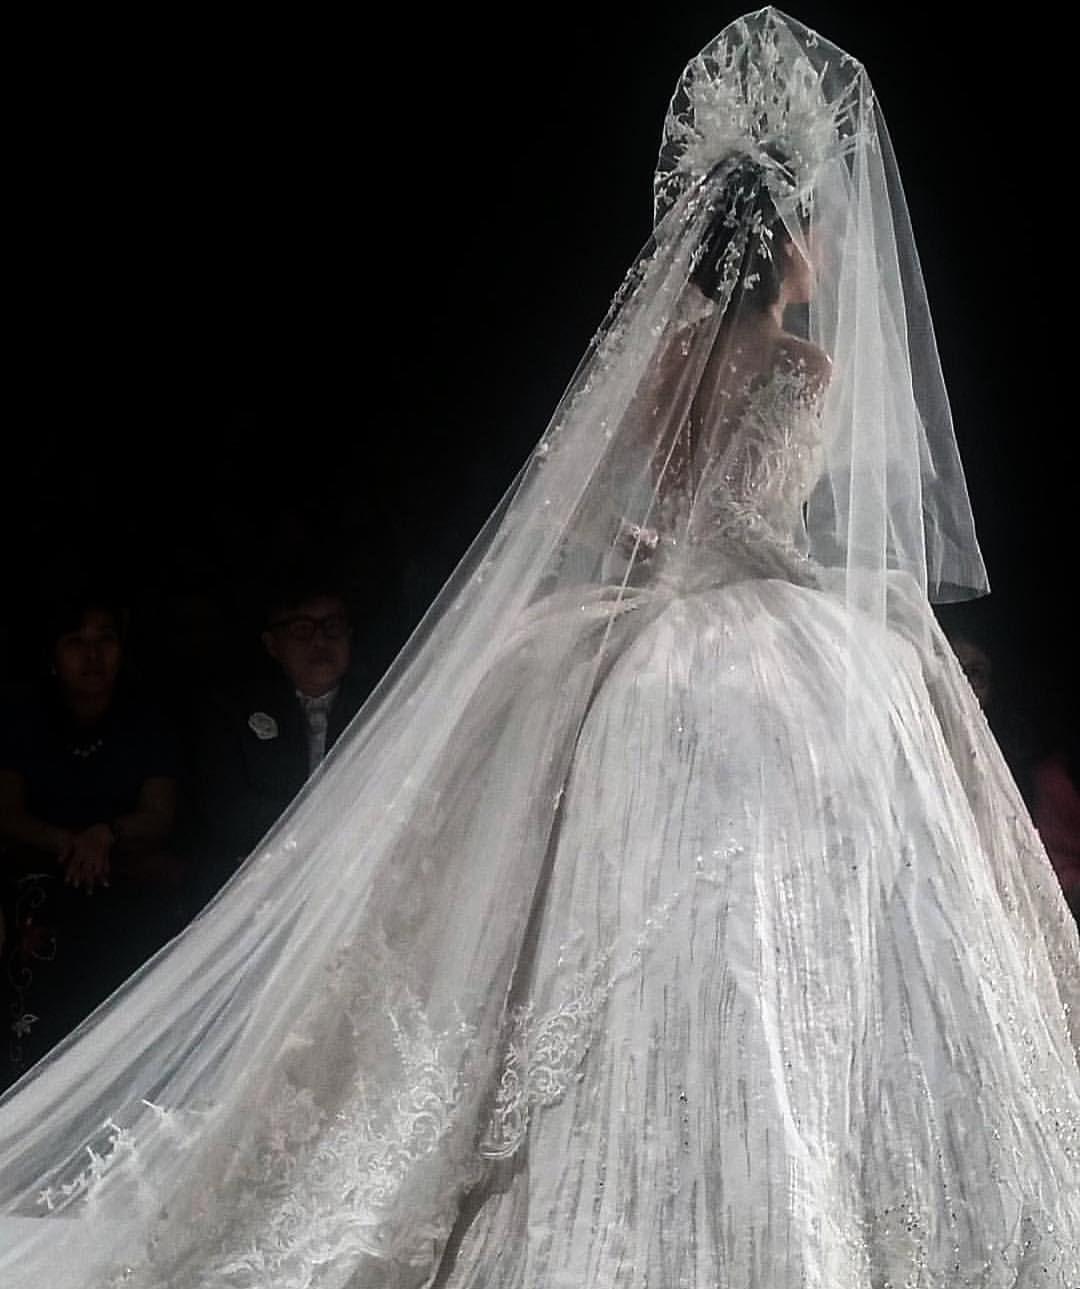 Pin by modhi on murad pinterest wedding veil and wedding dress